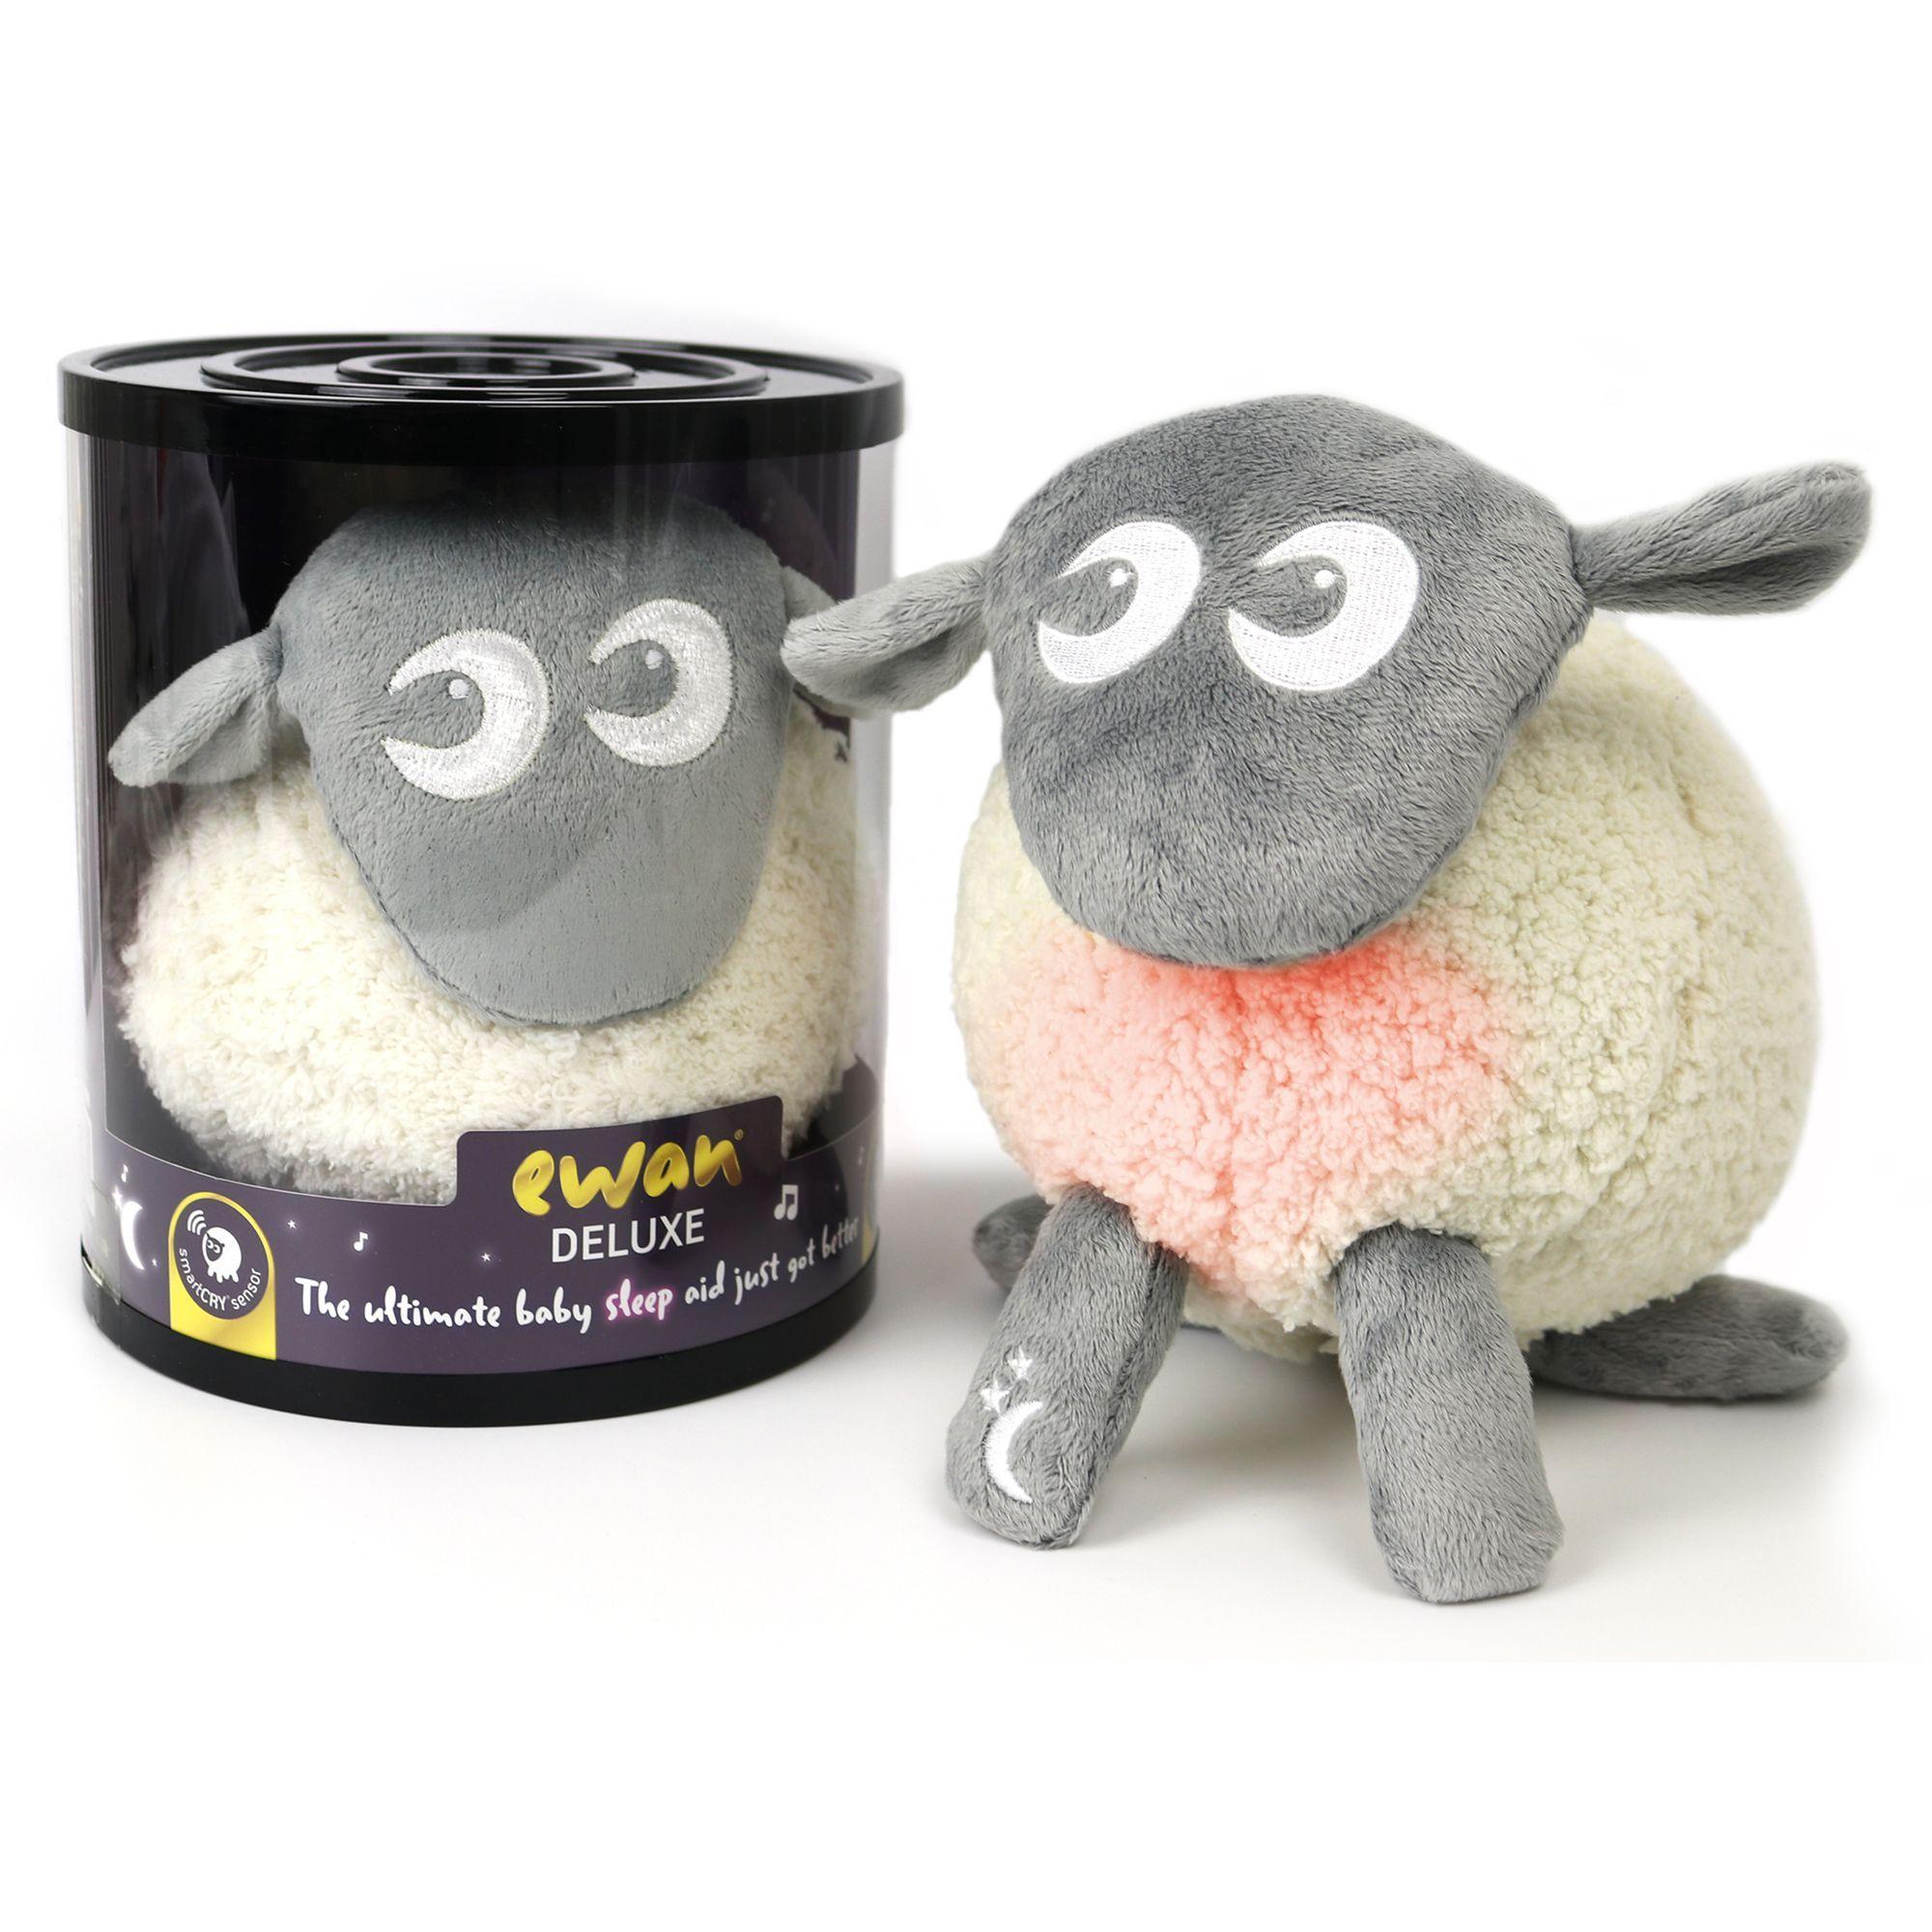 SWEET DREAMERS EWAN DREAM SHEEP GREY BRAND NEW GREAT GIFT BOXED